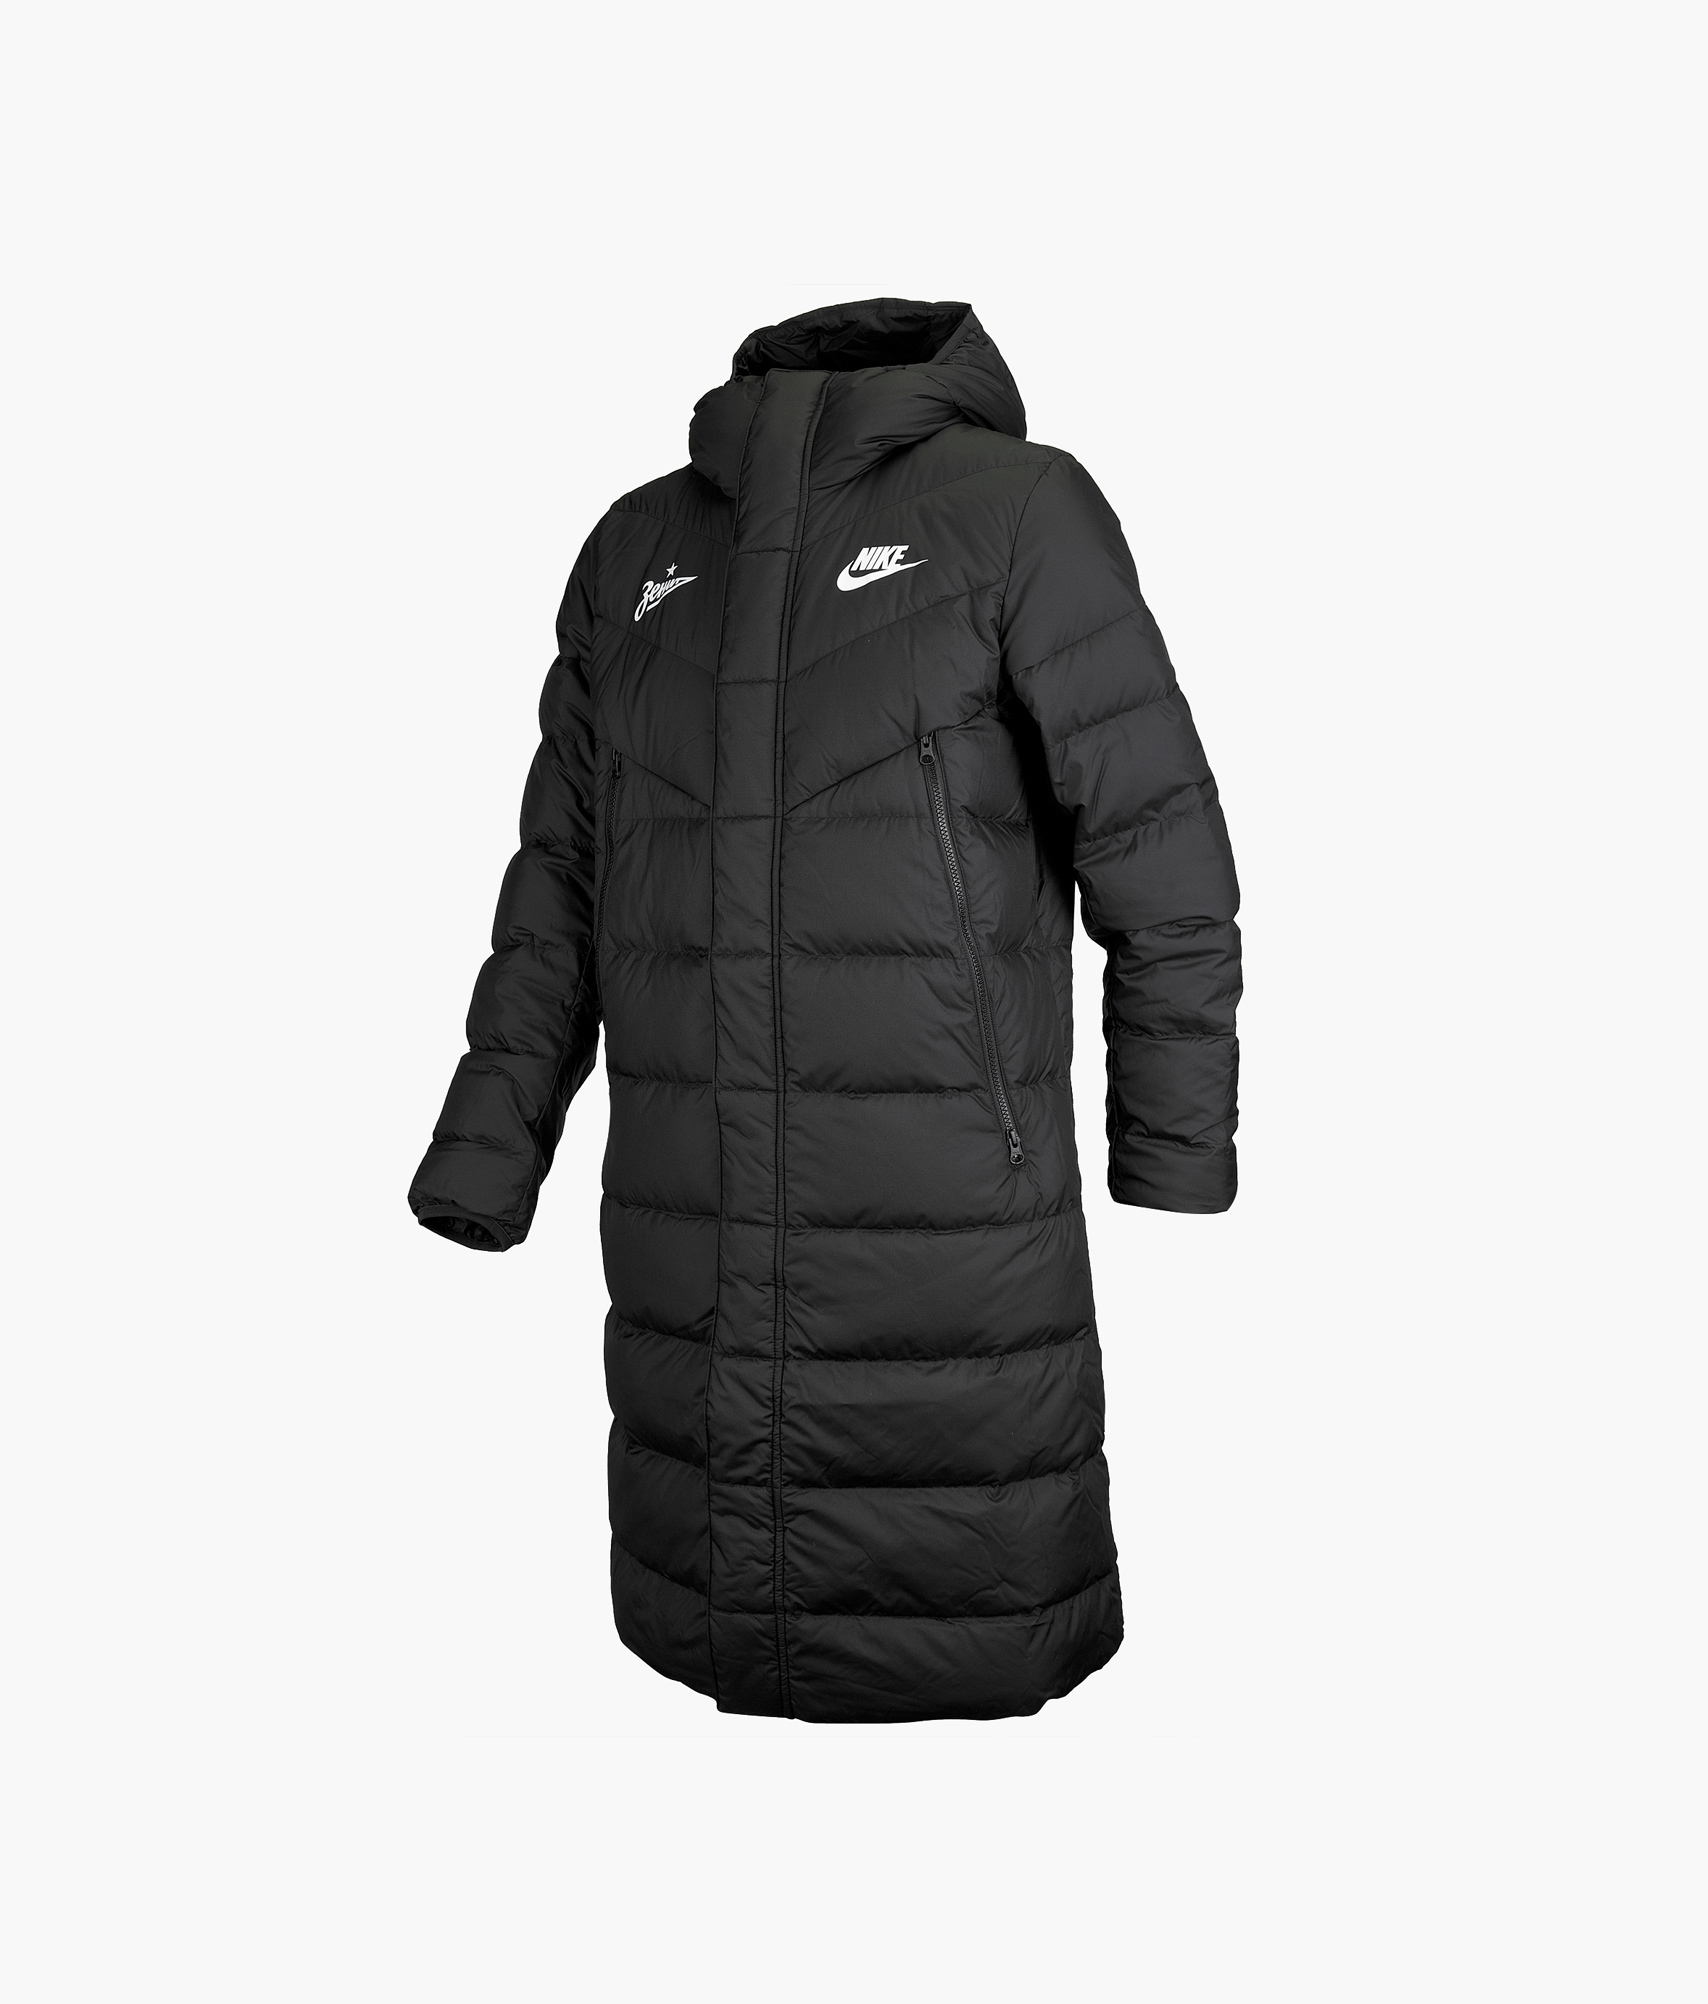 Пуховик мужской Nike Nike Цвет-Черный